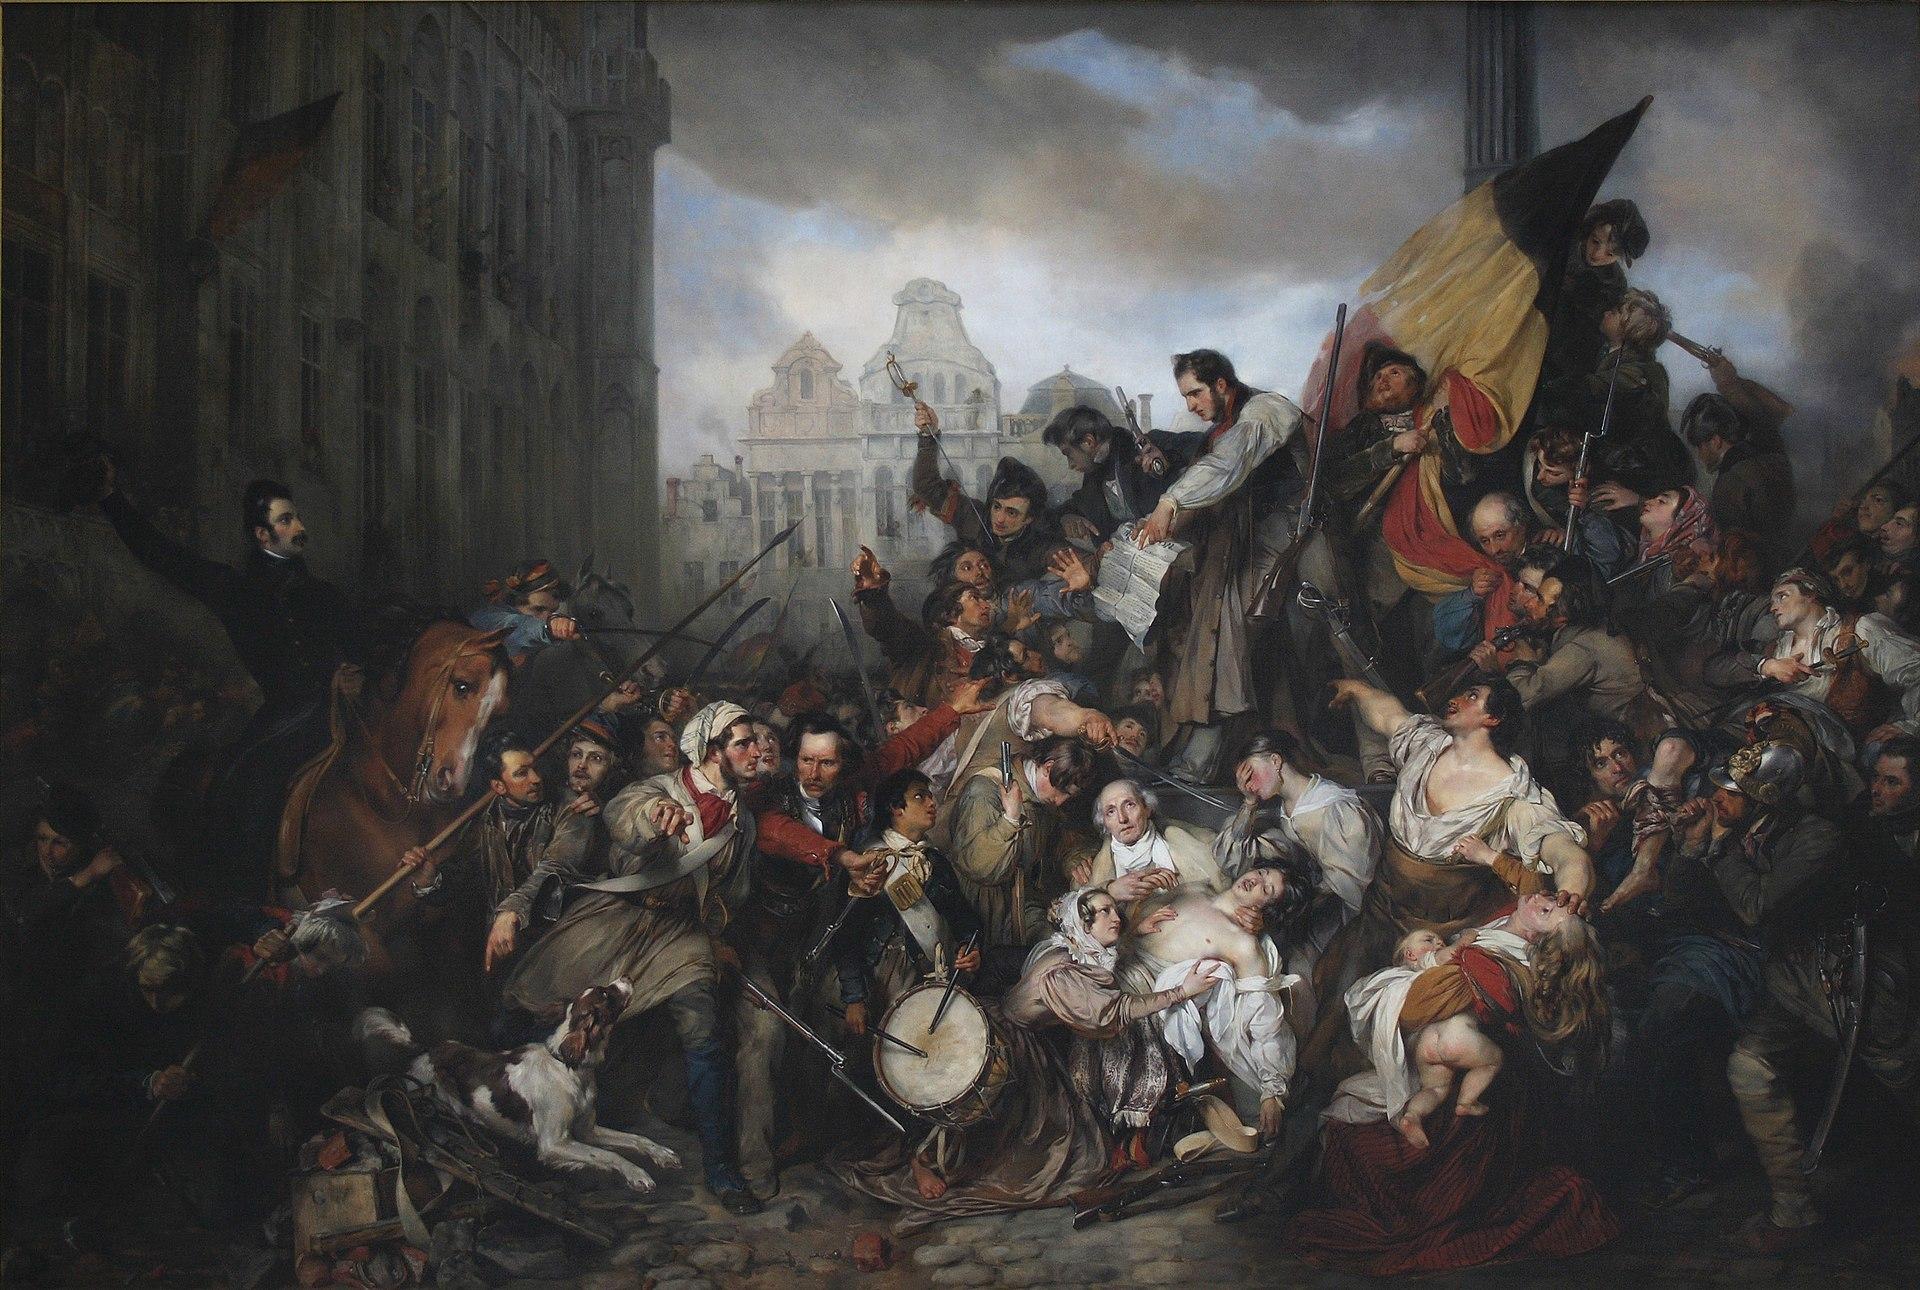 1920px Wappers Episodes from September Days 1830 on the Place de l Hôtel de Ville in Brussels